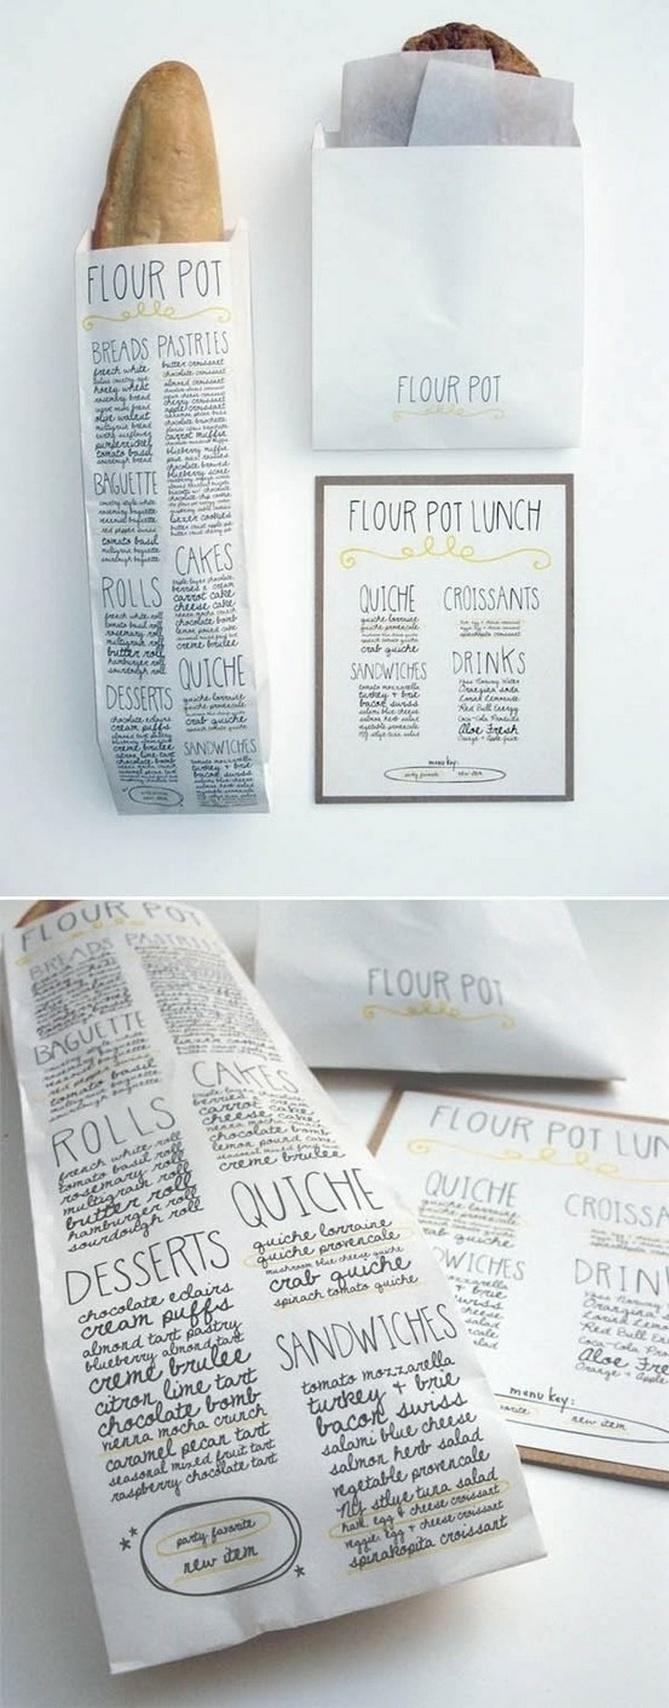 original baguette packaging advertising